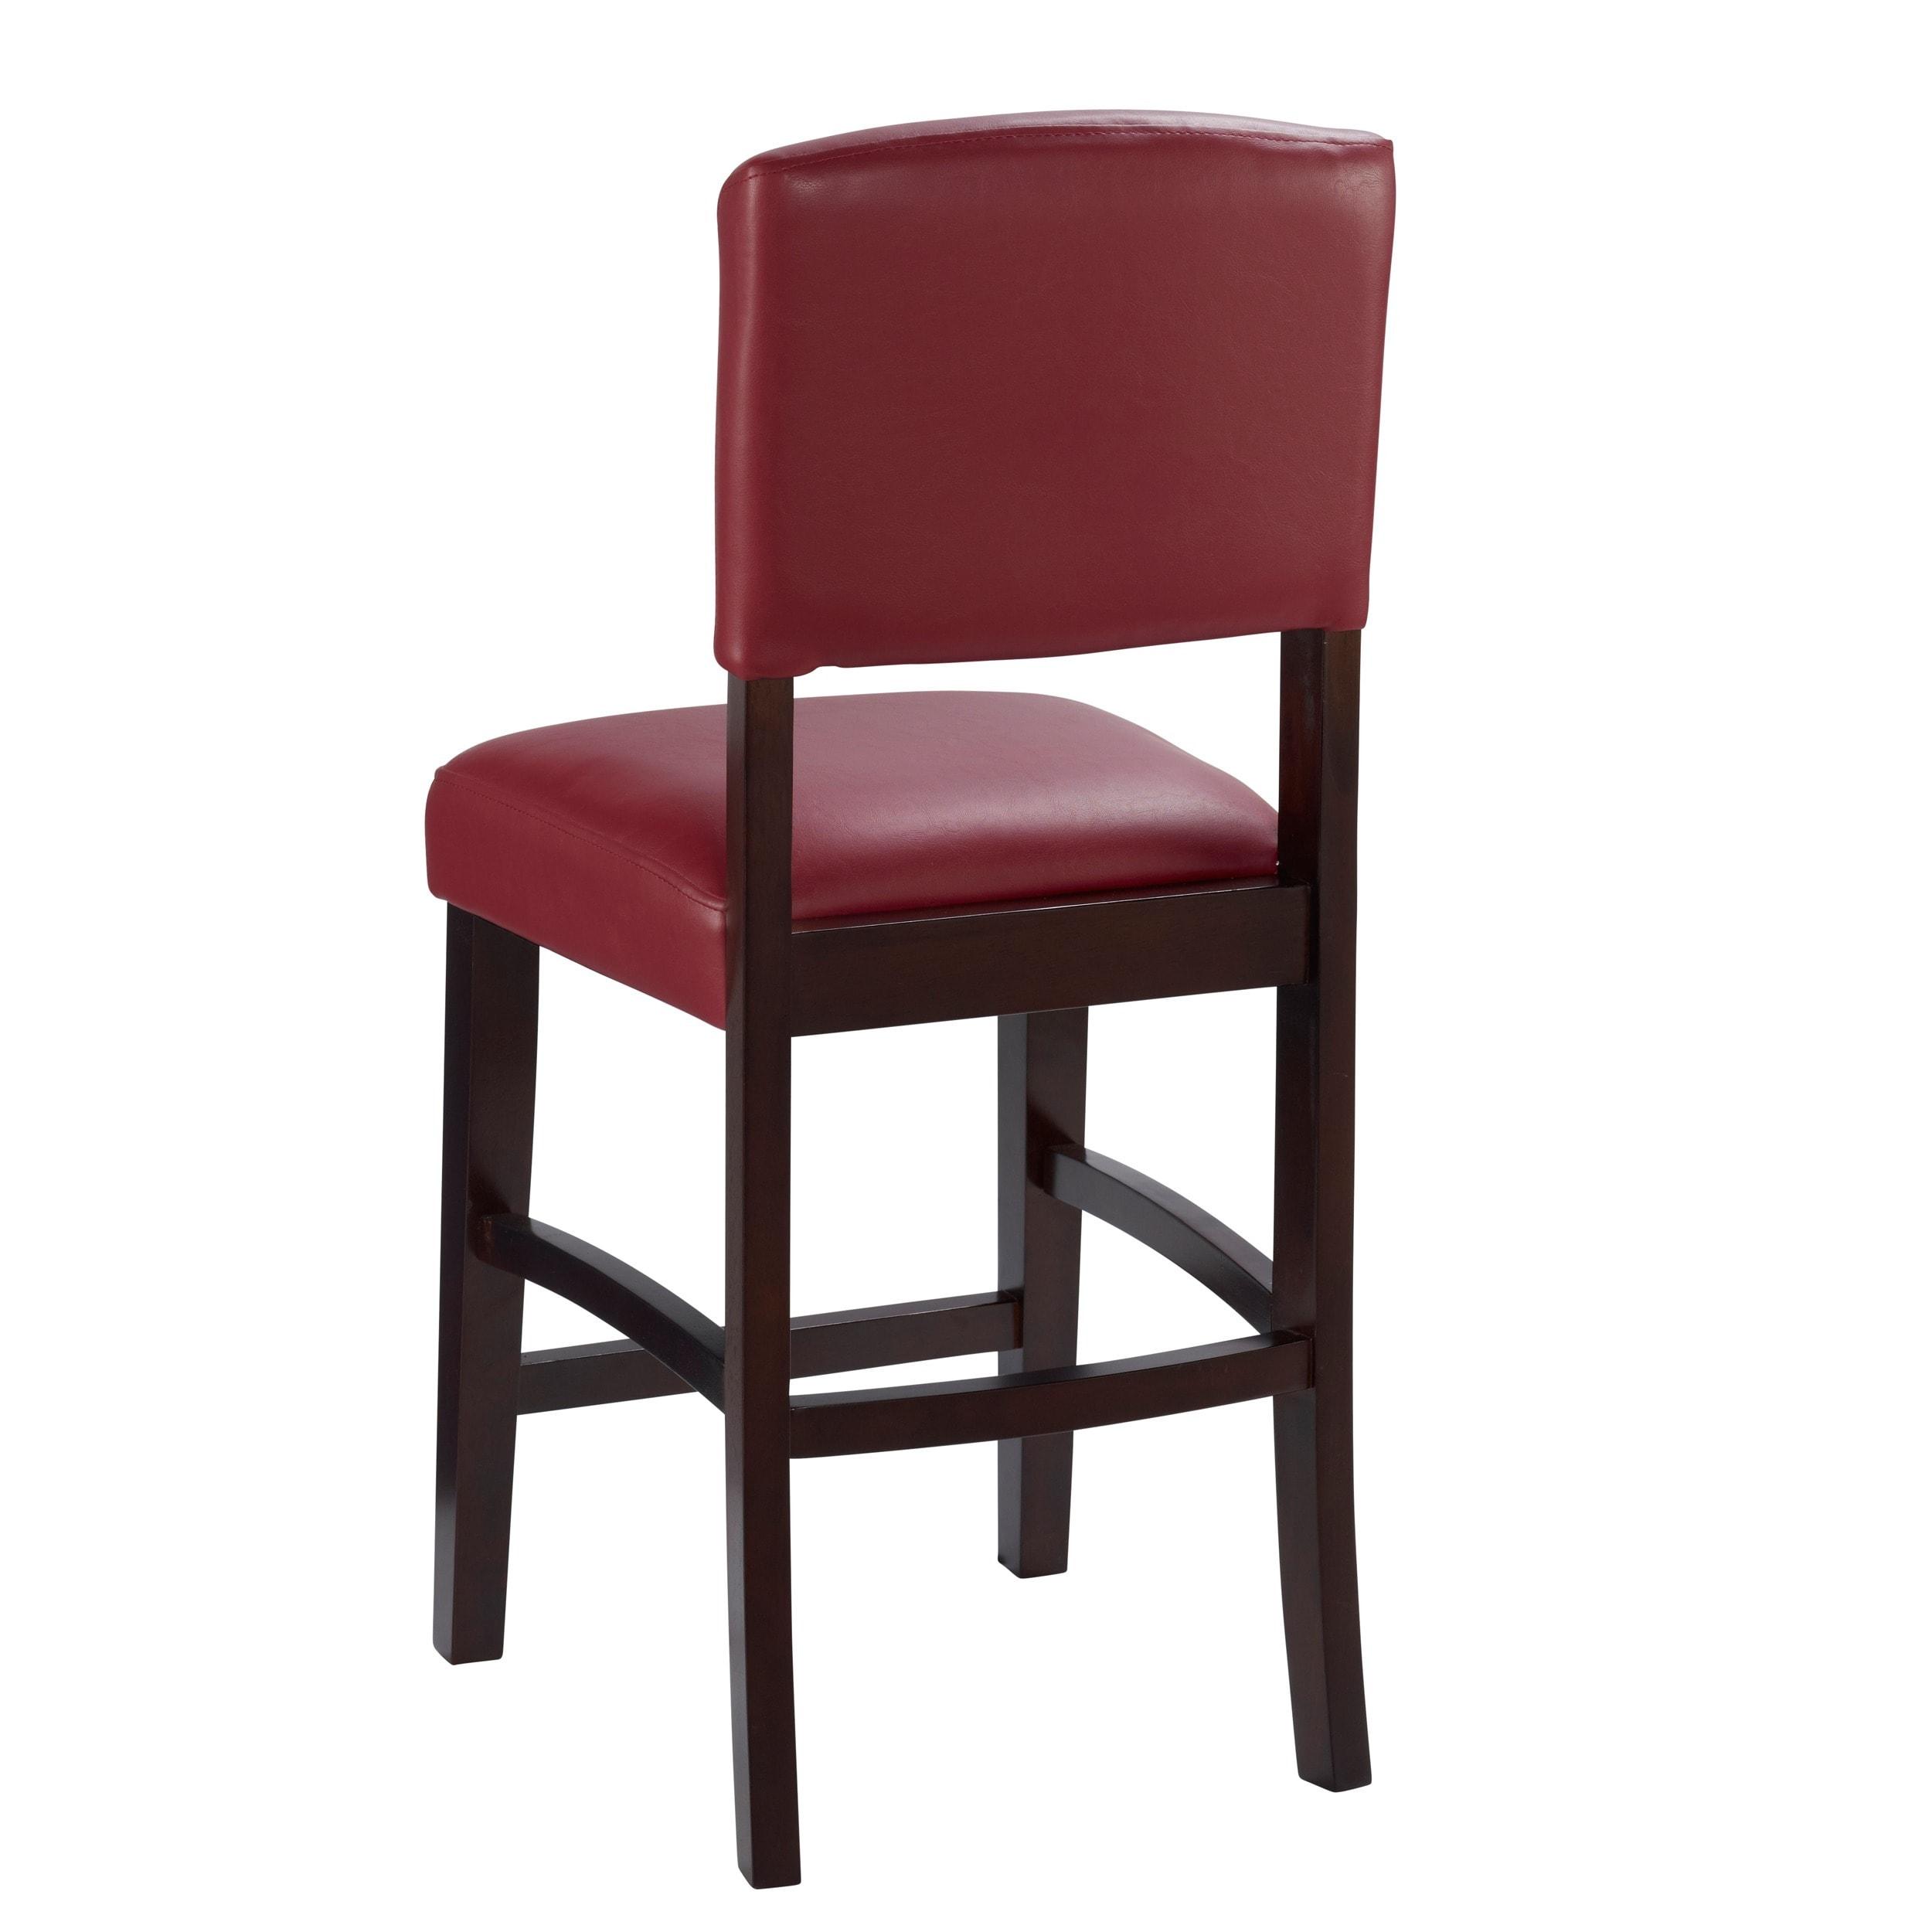 Awesome Linon Monte Carlo Stationary Counter Stool Dark Red Vinyl Machost Co Dining Chair Design Ideas Machostcouk